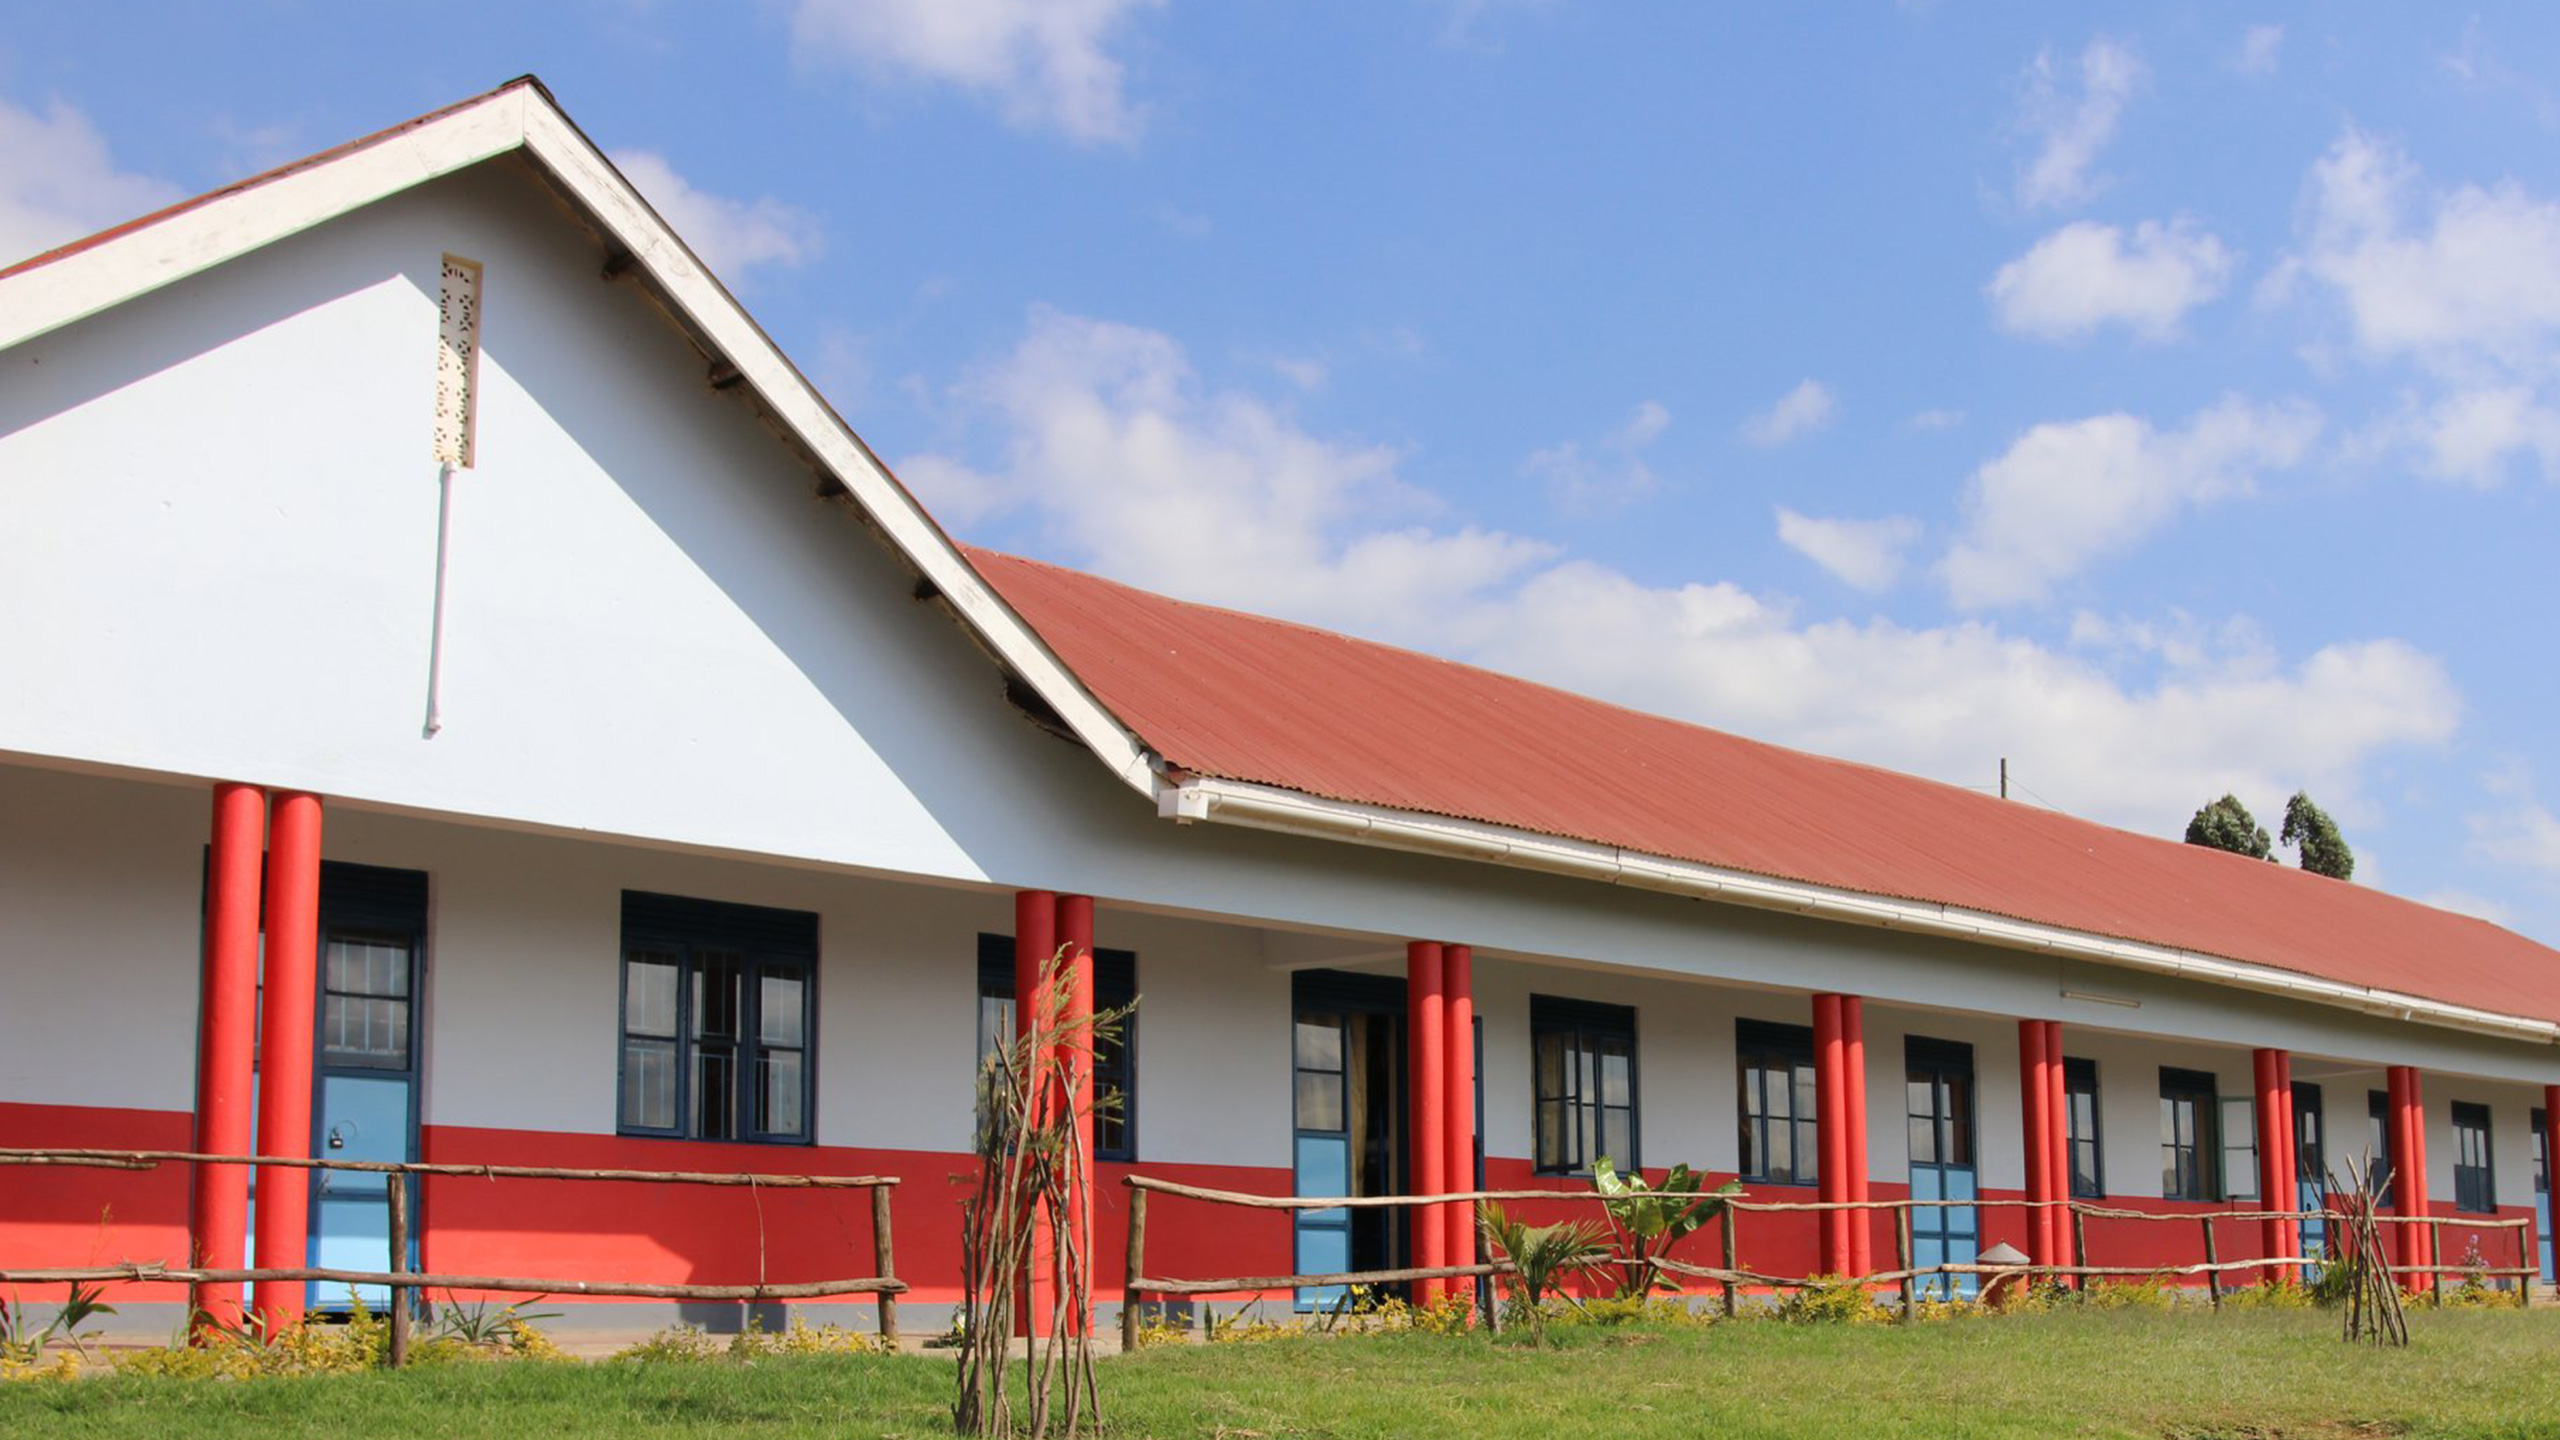 Besøk på en secondary school